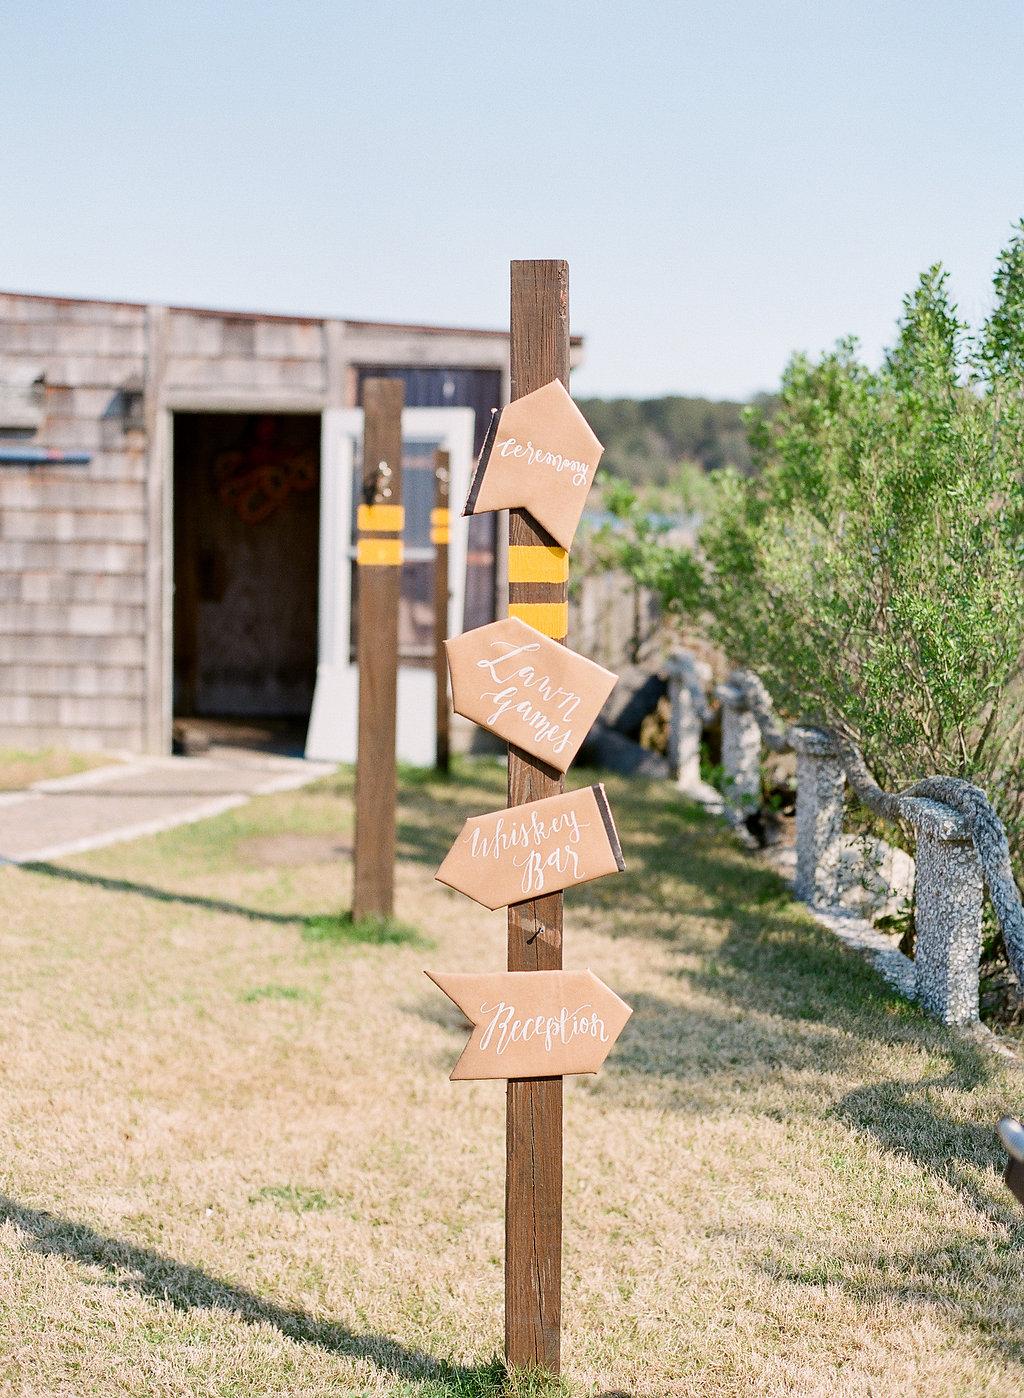 the-wyld-dock-bar-ivory-and-beau-savannah-wedding-planner-savannah-event-designer-wedding-inspiration-savannah-wedding-florist.jpg